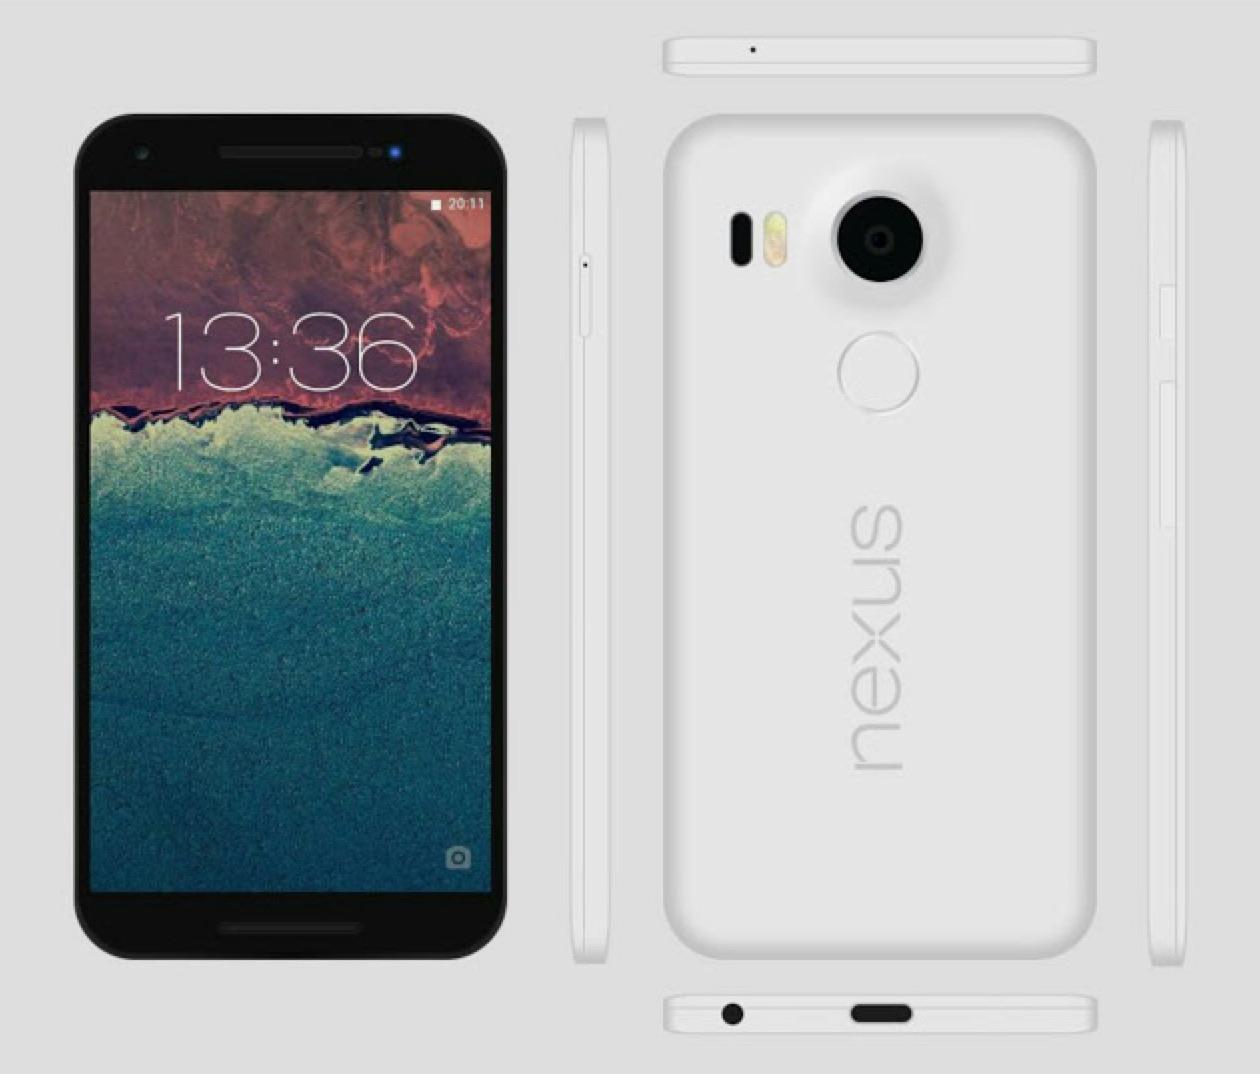 Nexus 5 2015 Photos Revealed; Specs, Release Dates, And More